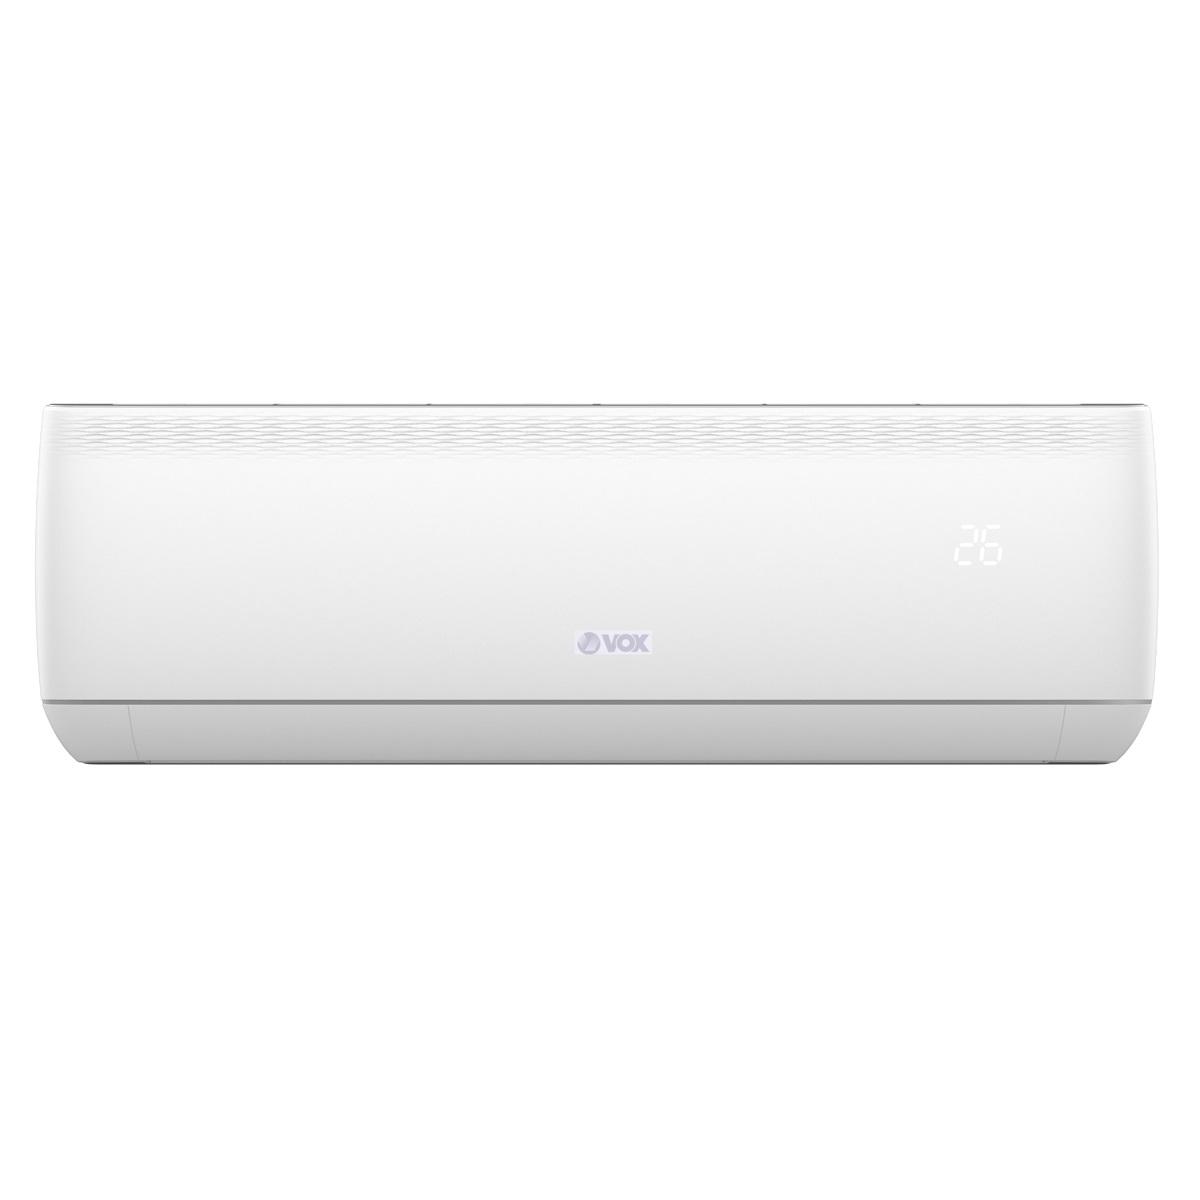 VOX klima uređaj inverter IVA1-18JR - Inelektronik